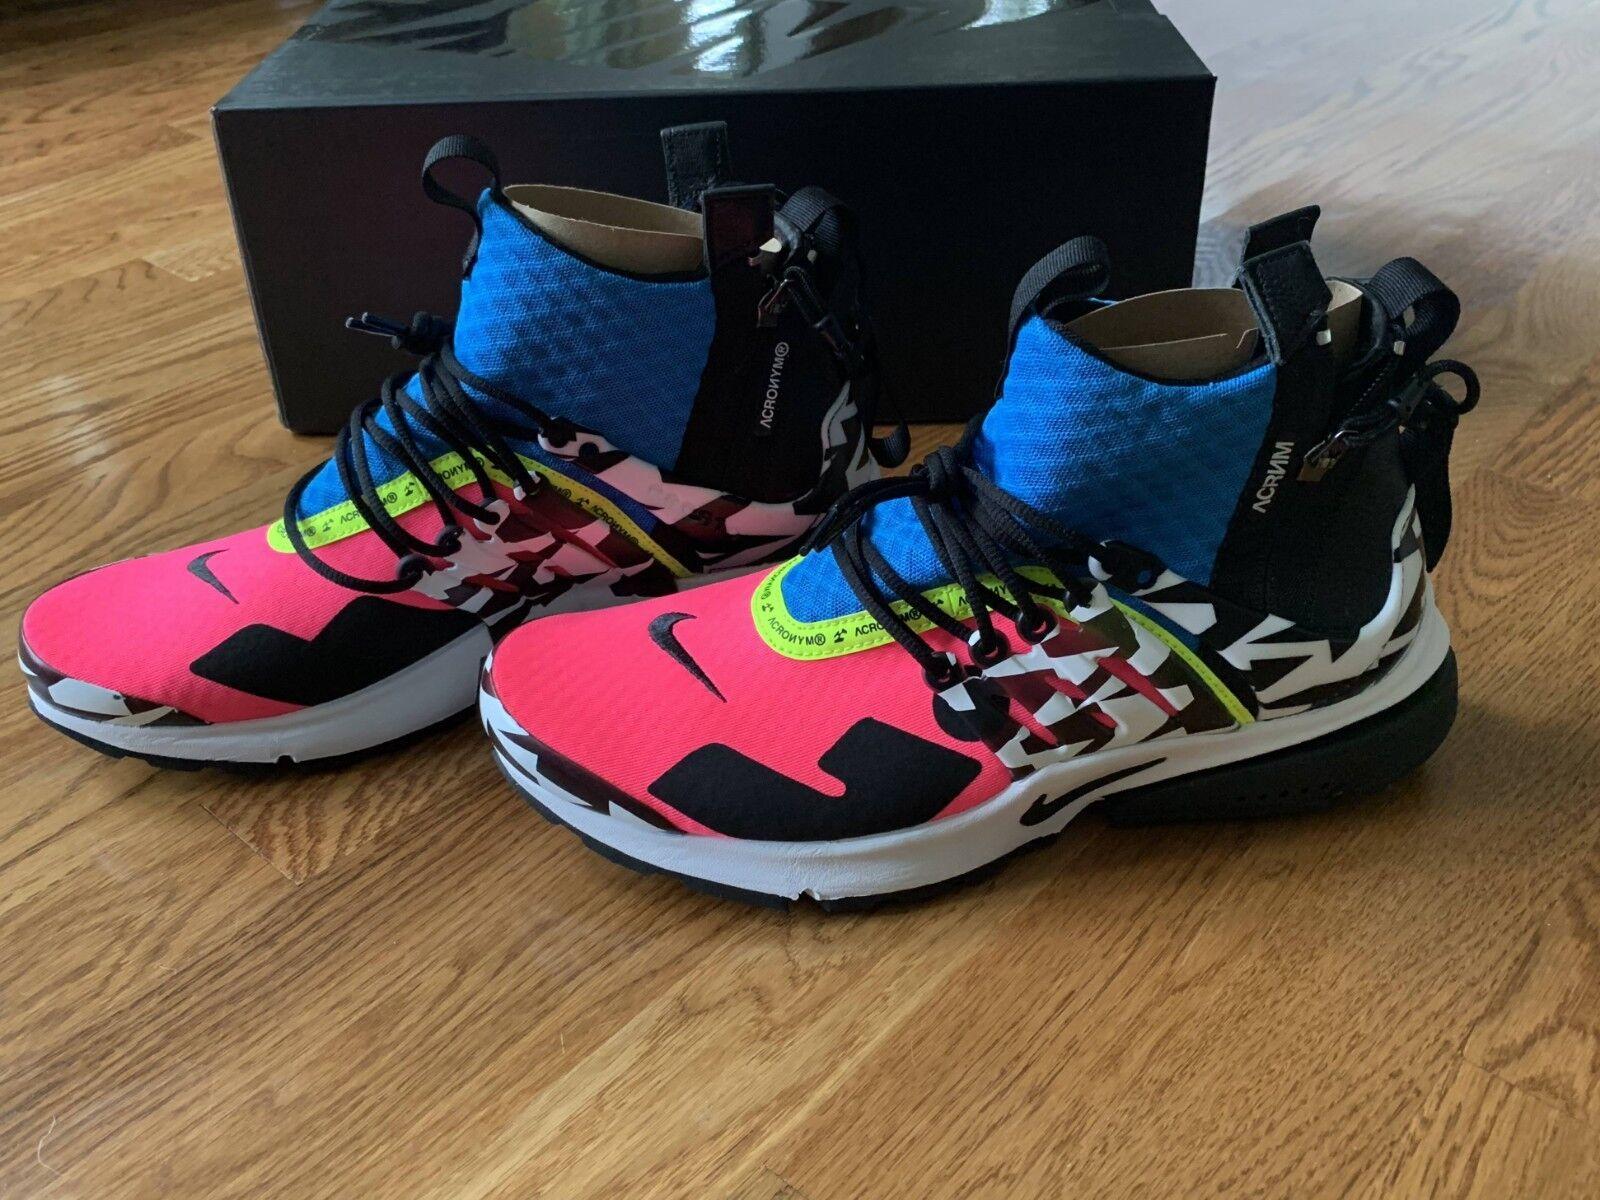 Nike Akronym Presto Presto Presto Luft Mittelgroße Us 10 UK 9, Eu 44, cm 2 Racer Rosa  b11d00